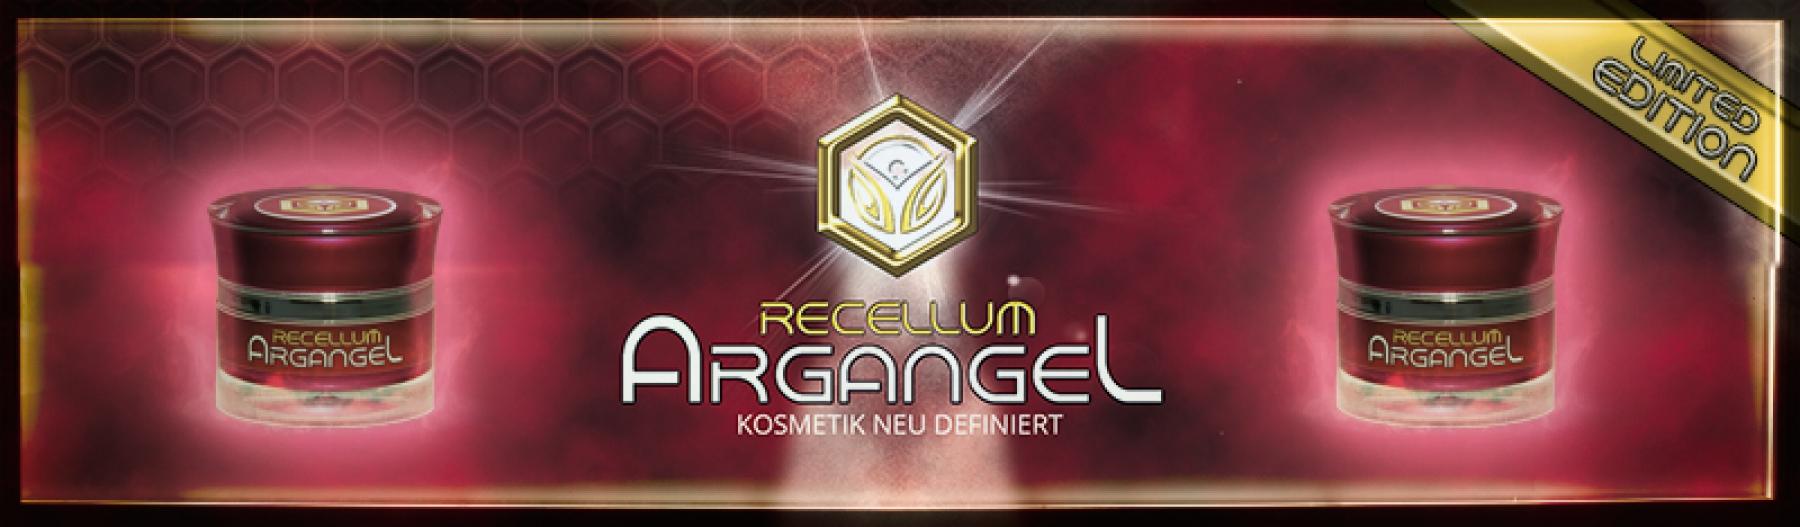 Recellum Argangel - Kosmetik neu definiert